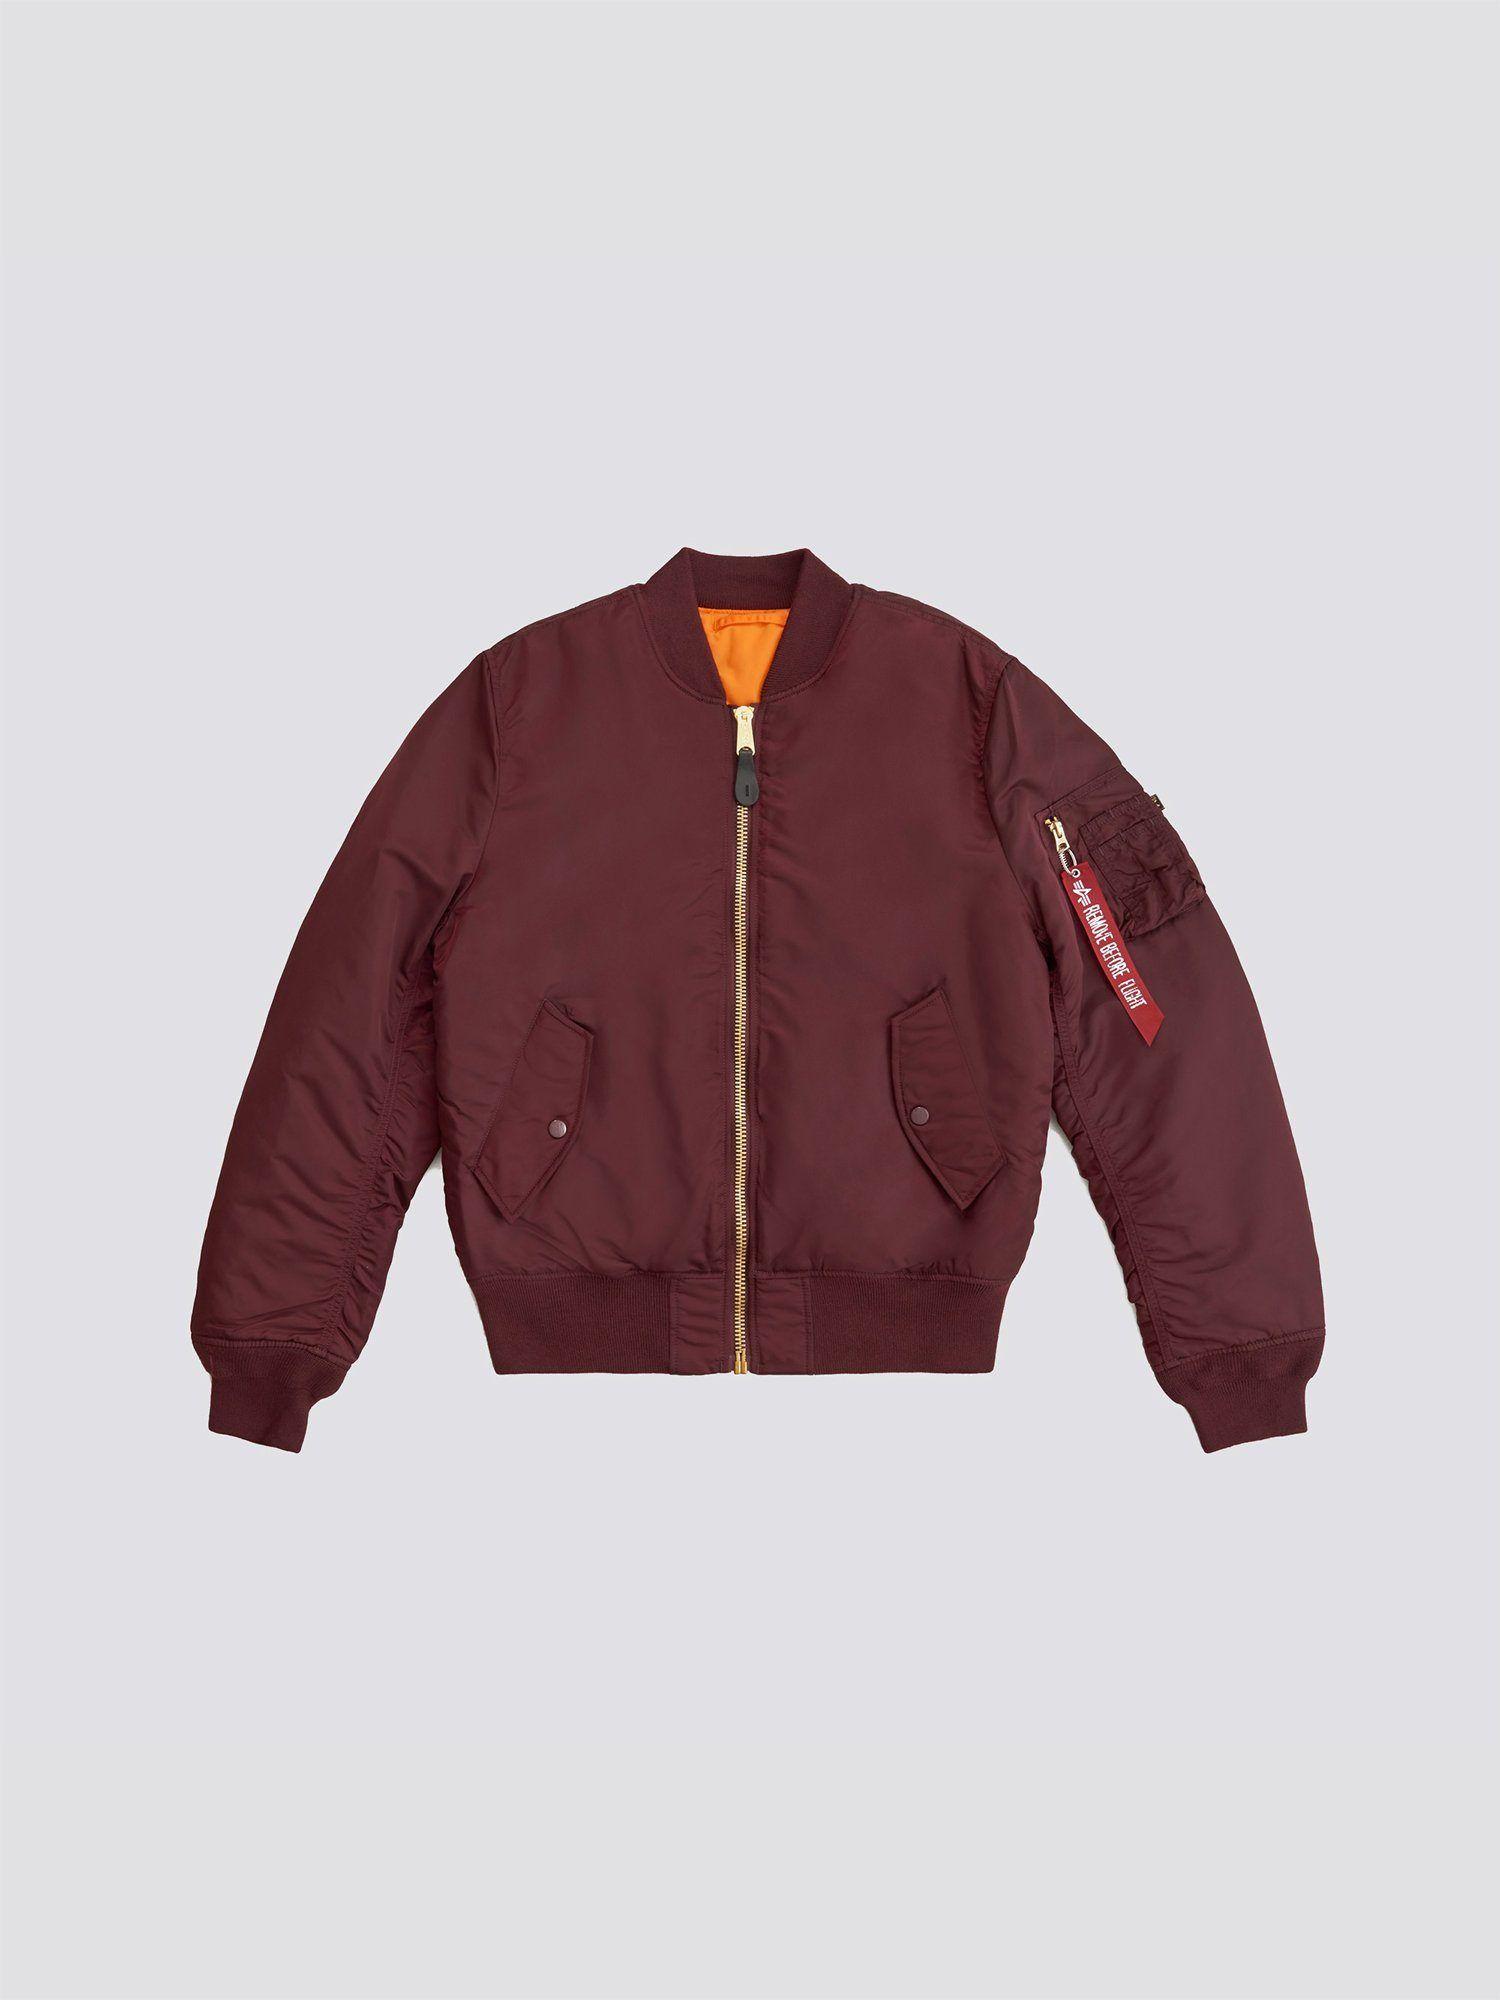 Ma 1 Bomber Jacket Slim Fit Seasonal Vintage Olive M Bomber Jacket Slim Fit Bomber Jacket Classic Bomber Jacket [ 2000 x 1500 Pixel ]